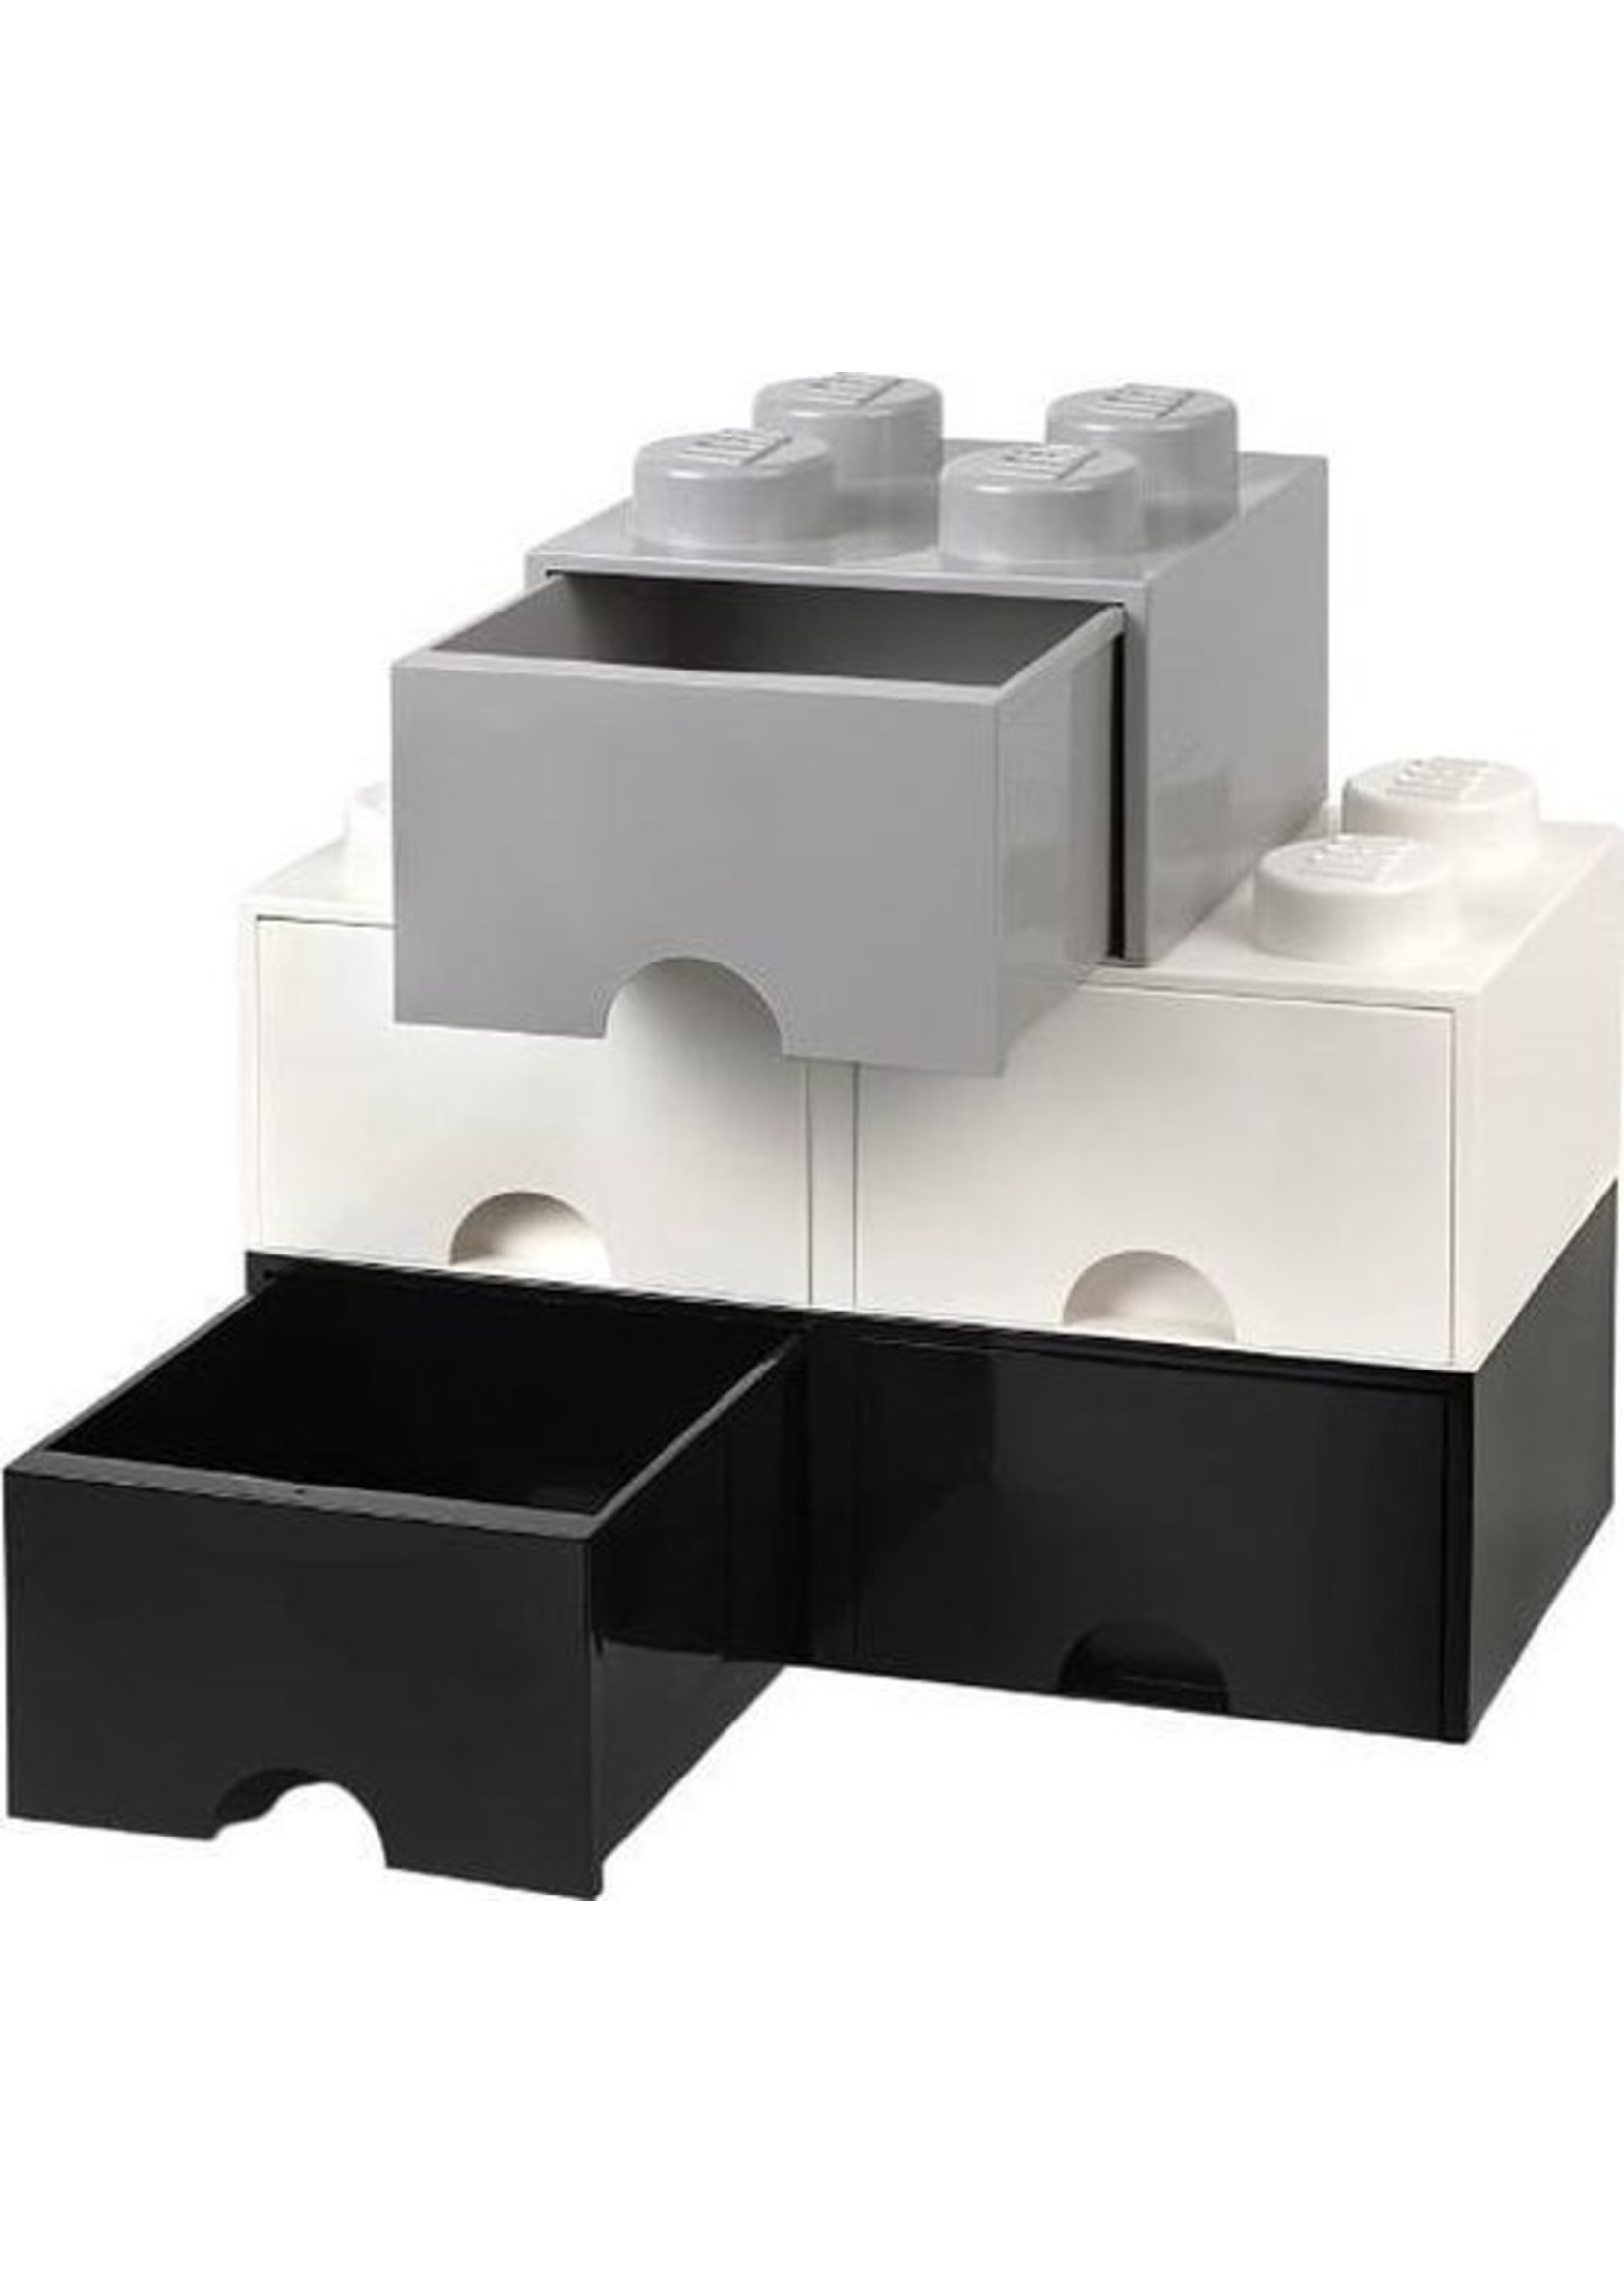 Lego LEGO Brick 8 Opbergbox - Kunststof - Zwart